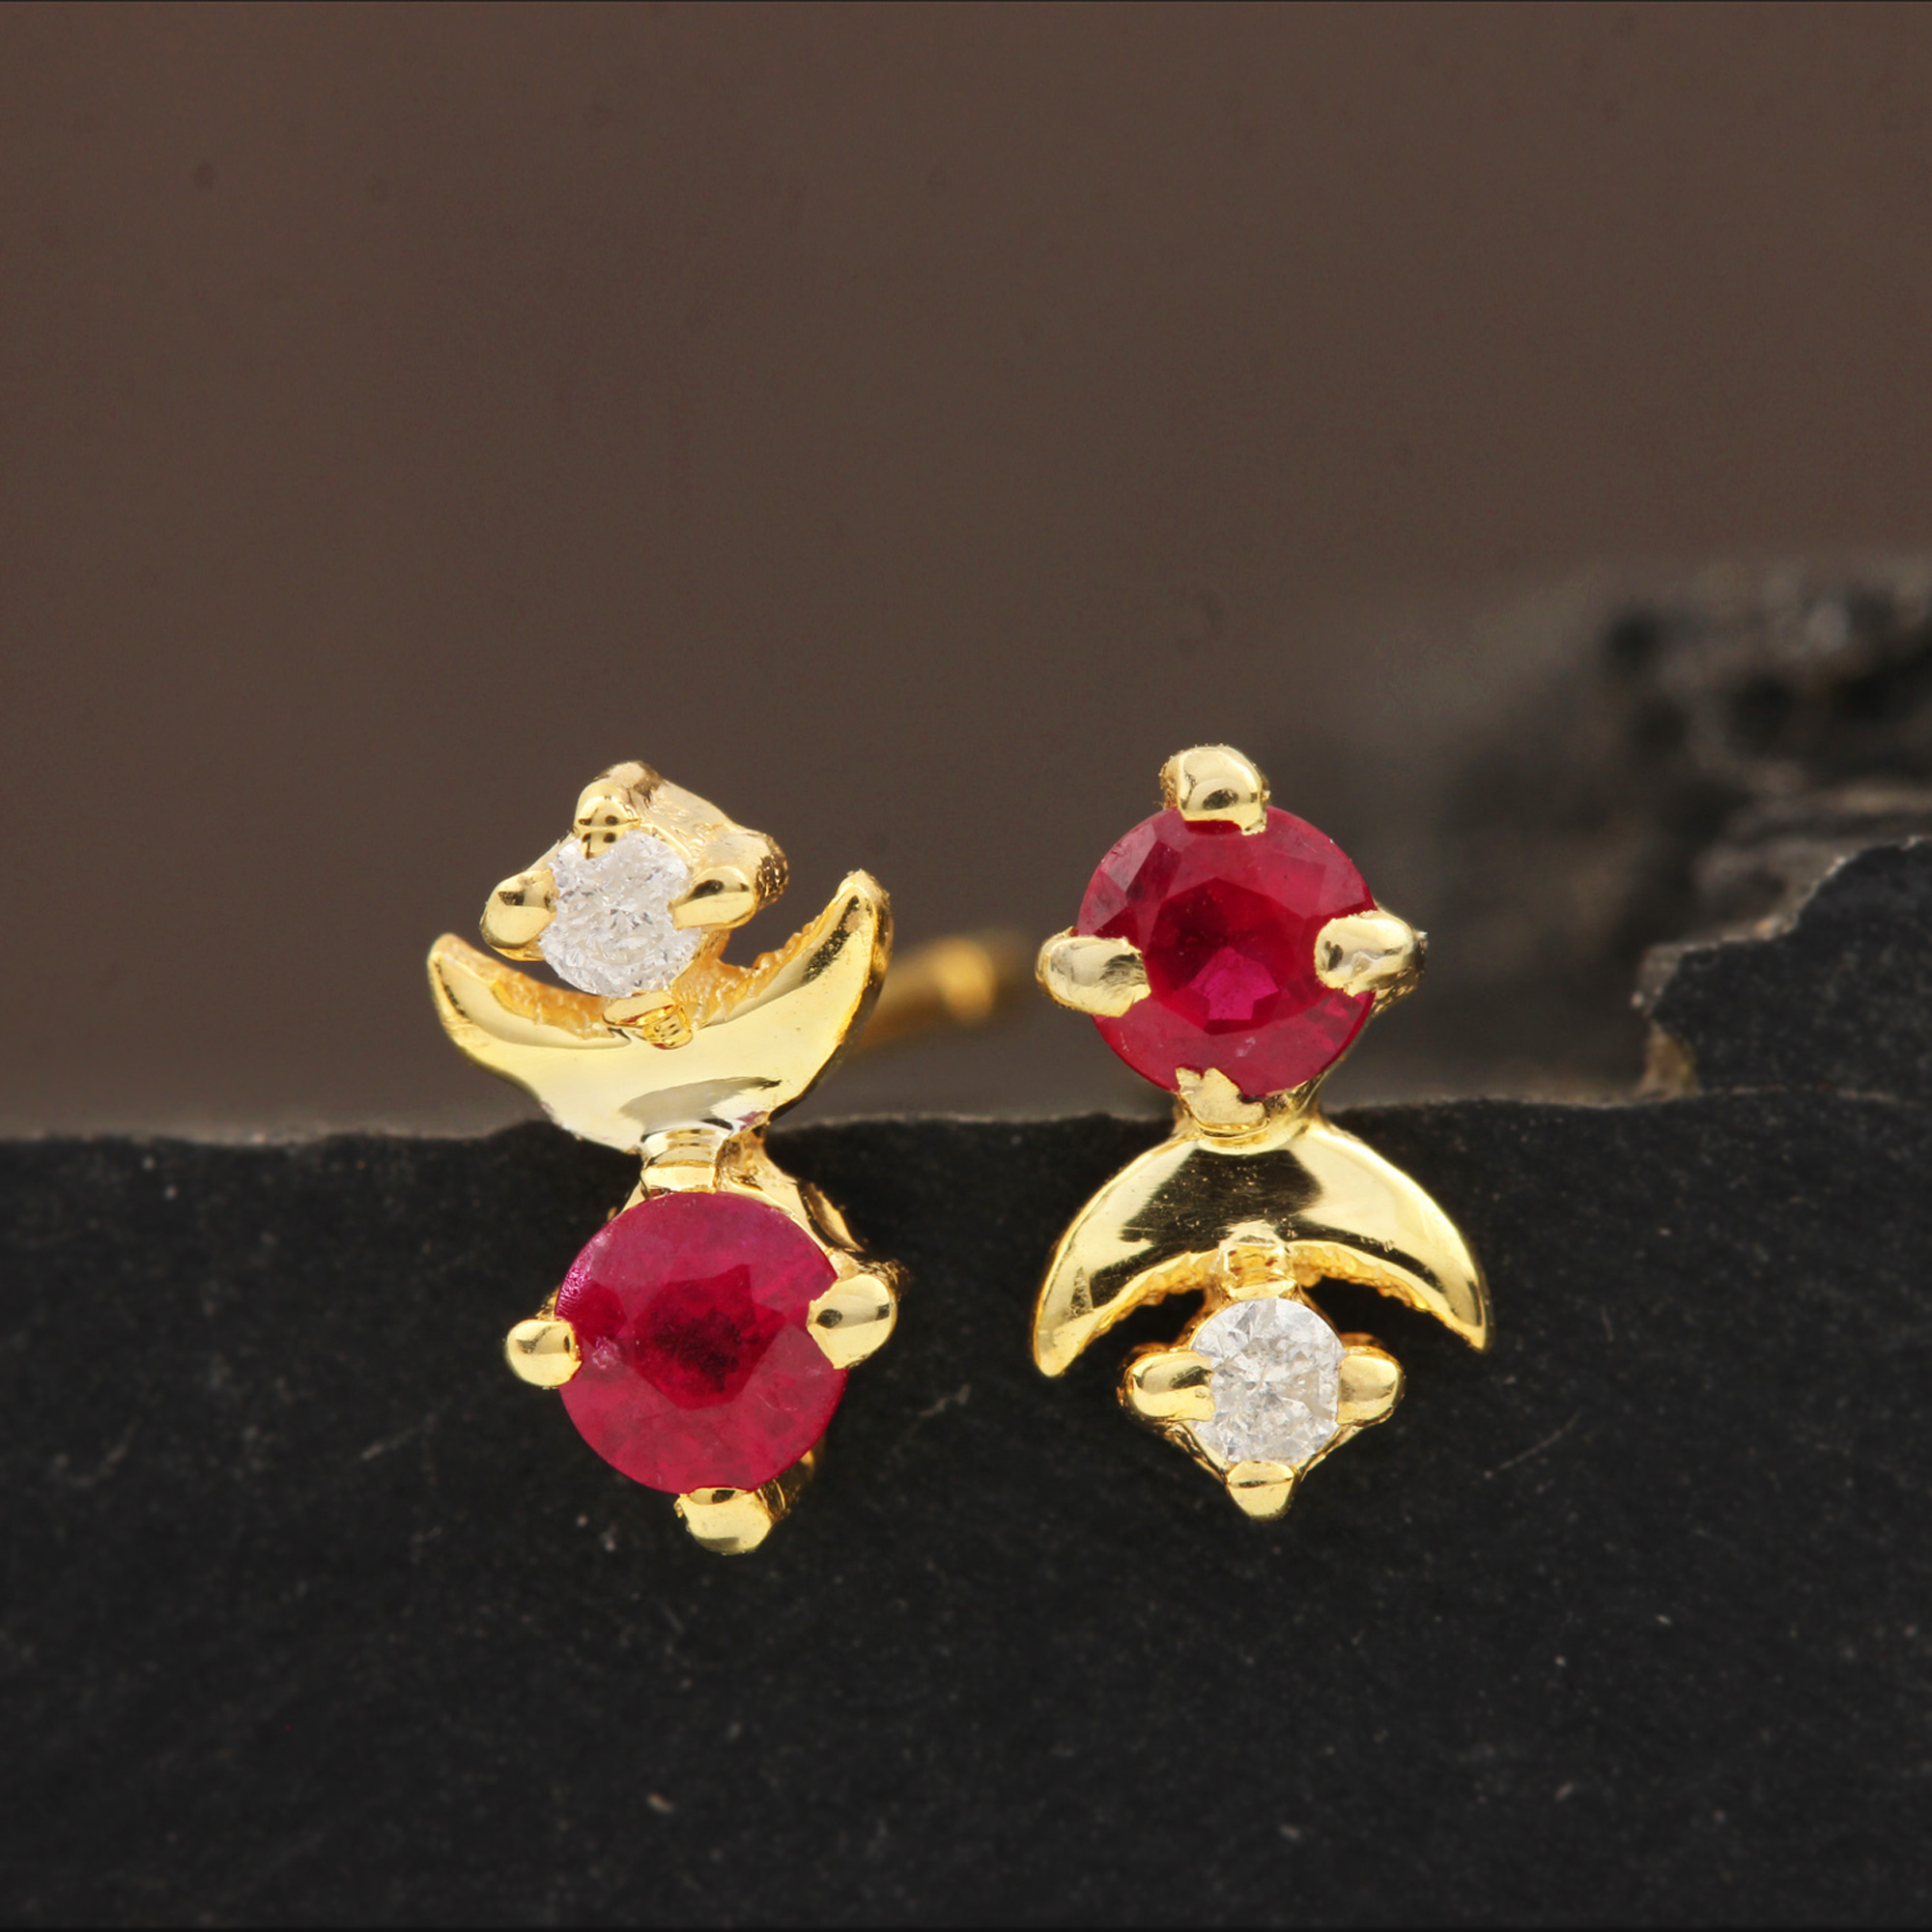 Natural Diamond 14k Solid Gold Ruby Minimalist Stud Earrings